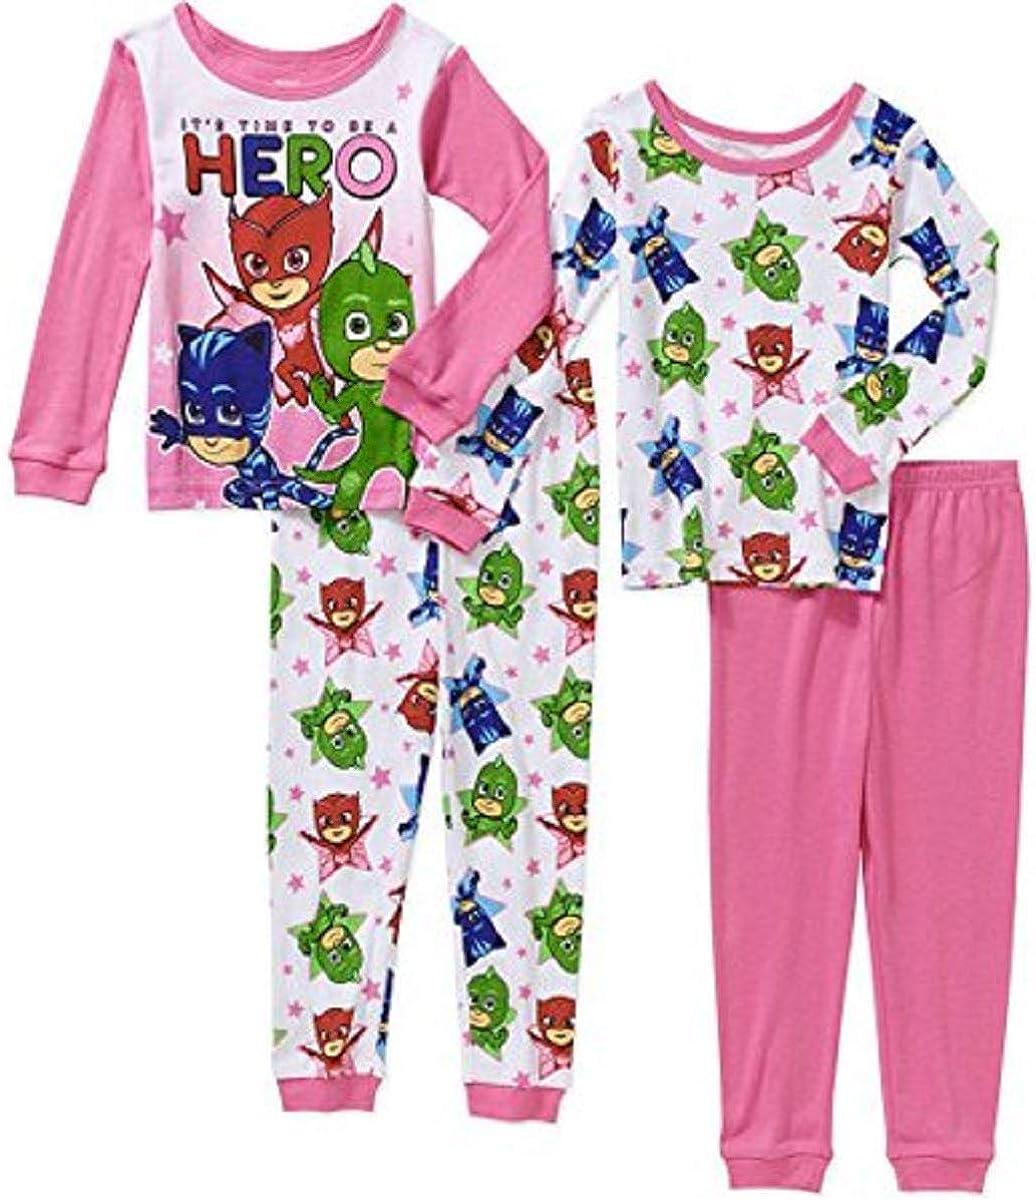 Girls' Pajamas with Fun Graphics, Mix and Match 4 Piece (Pink, 2T)